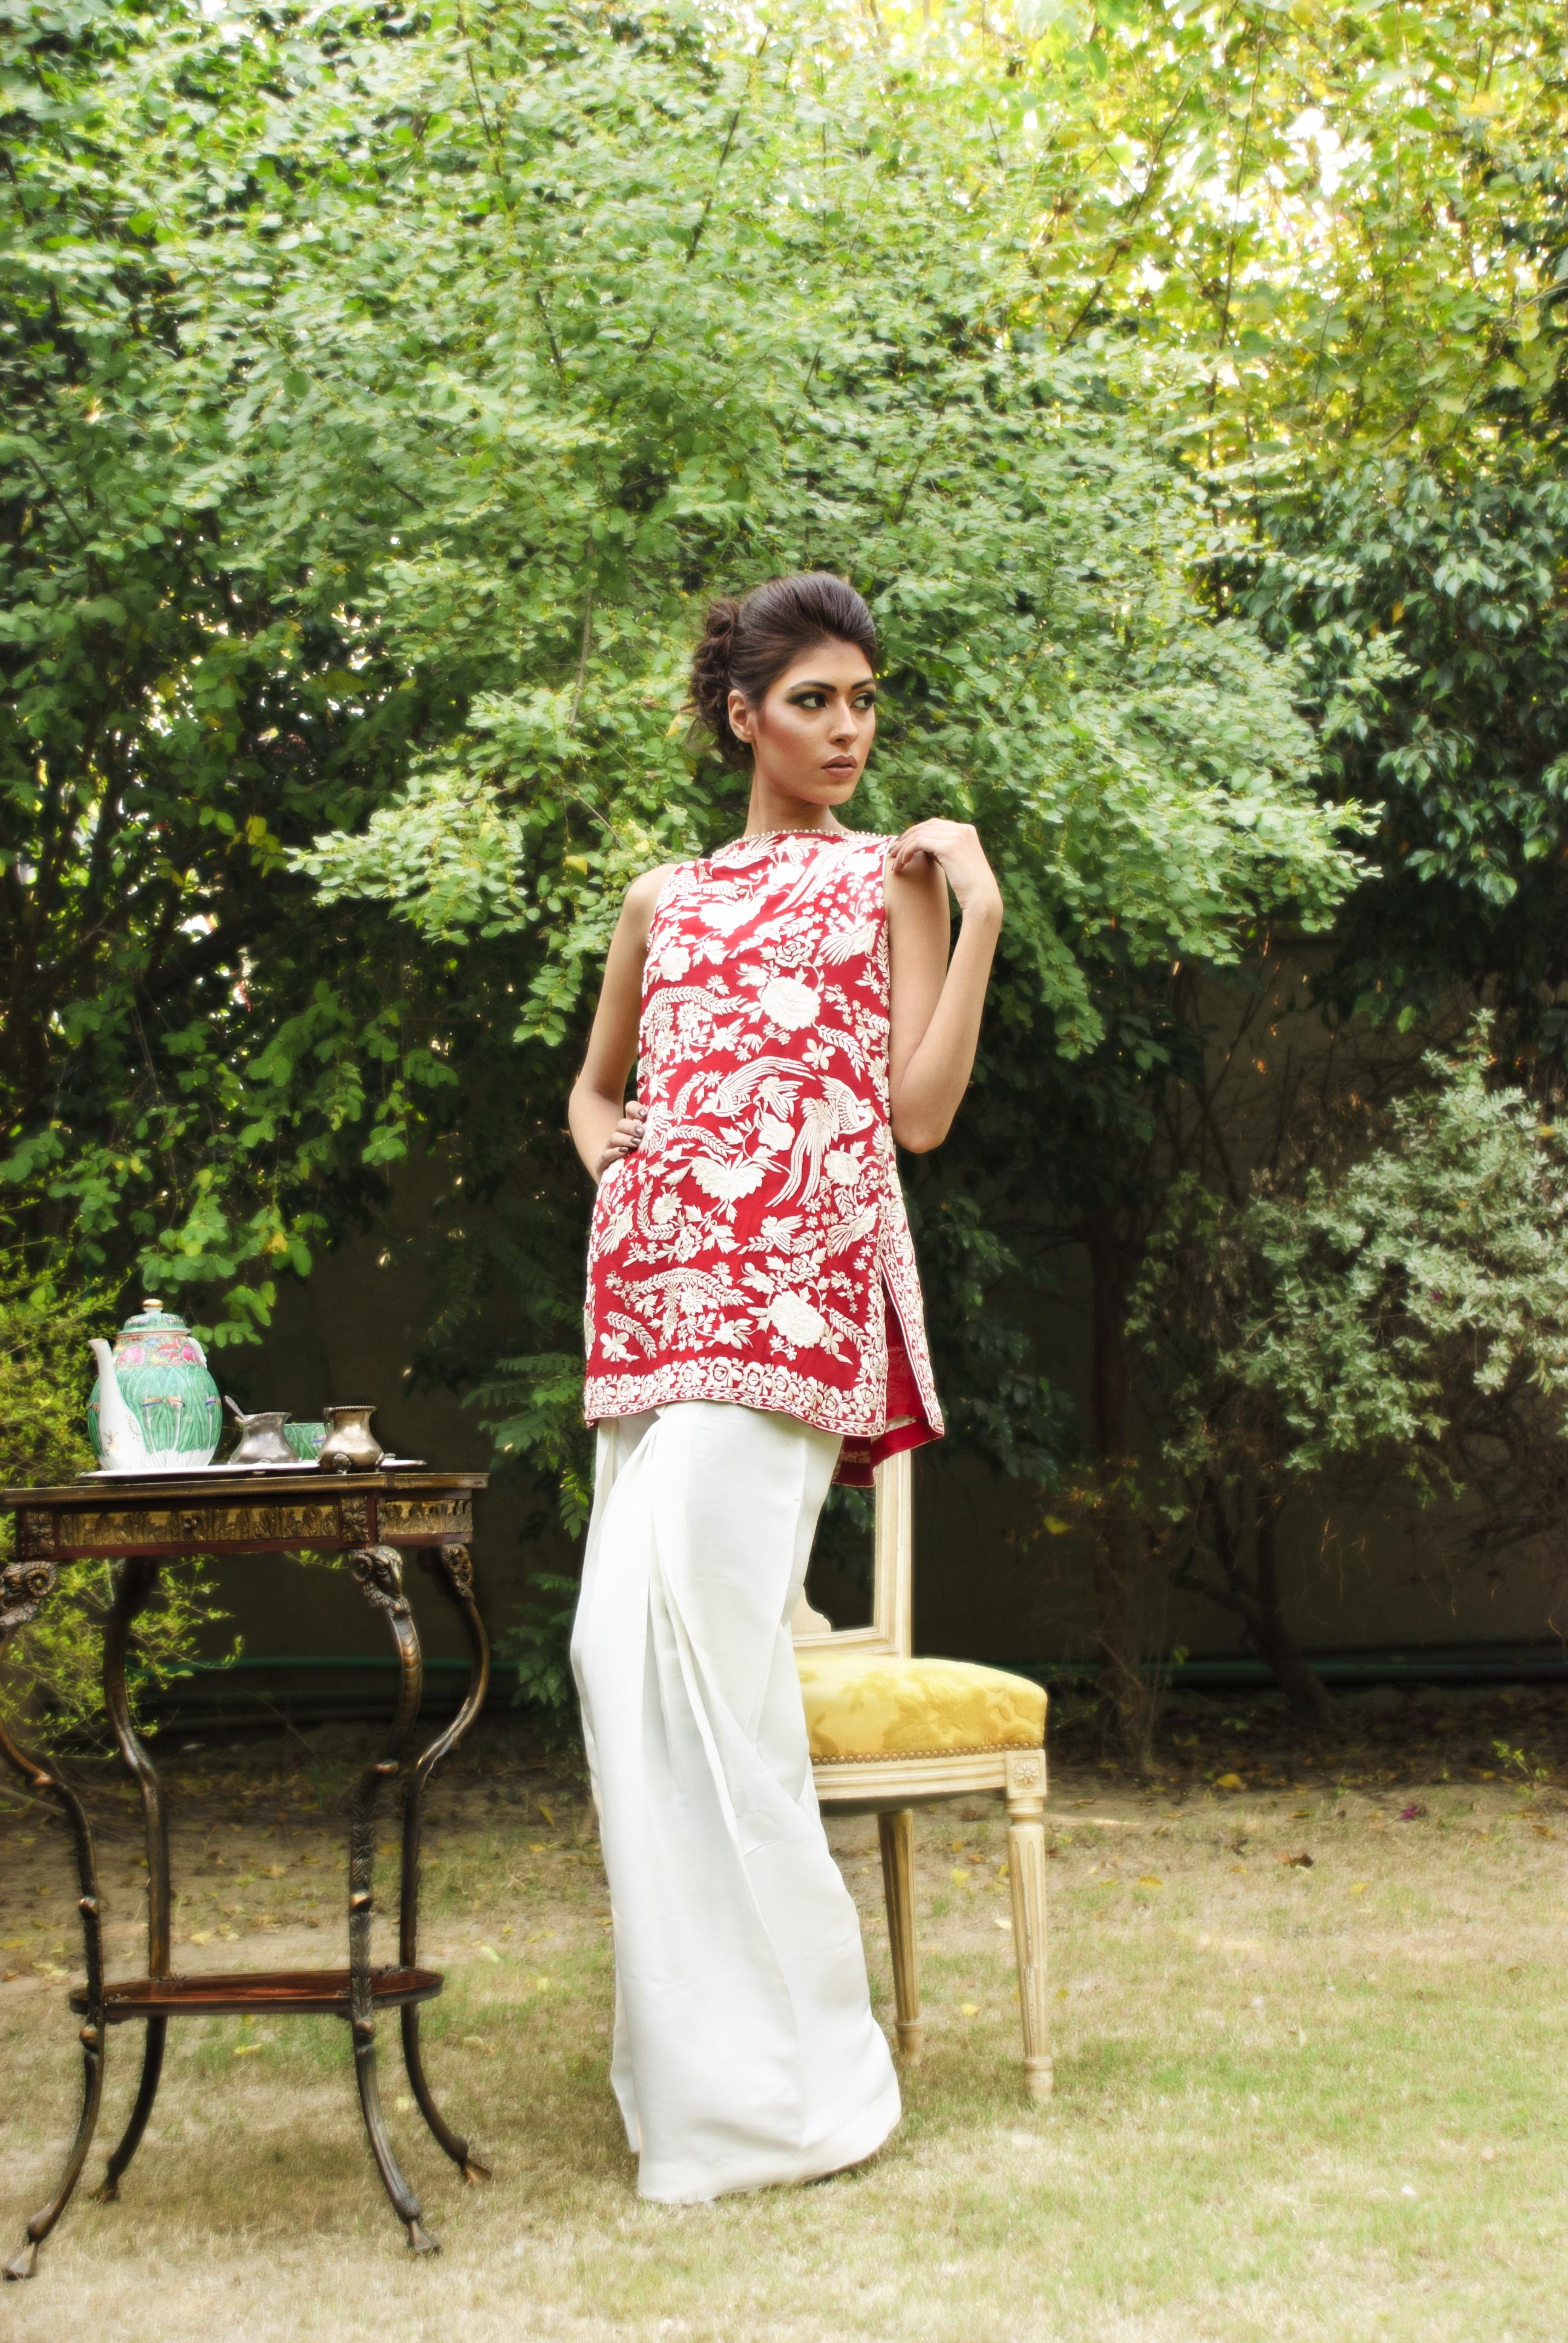 Mahgul for Nasreen Shaikh - Photography: Sara Khan